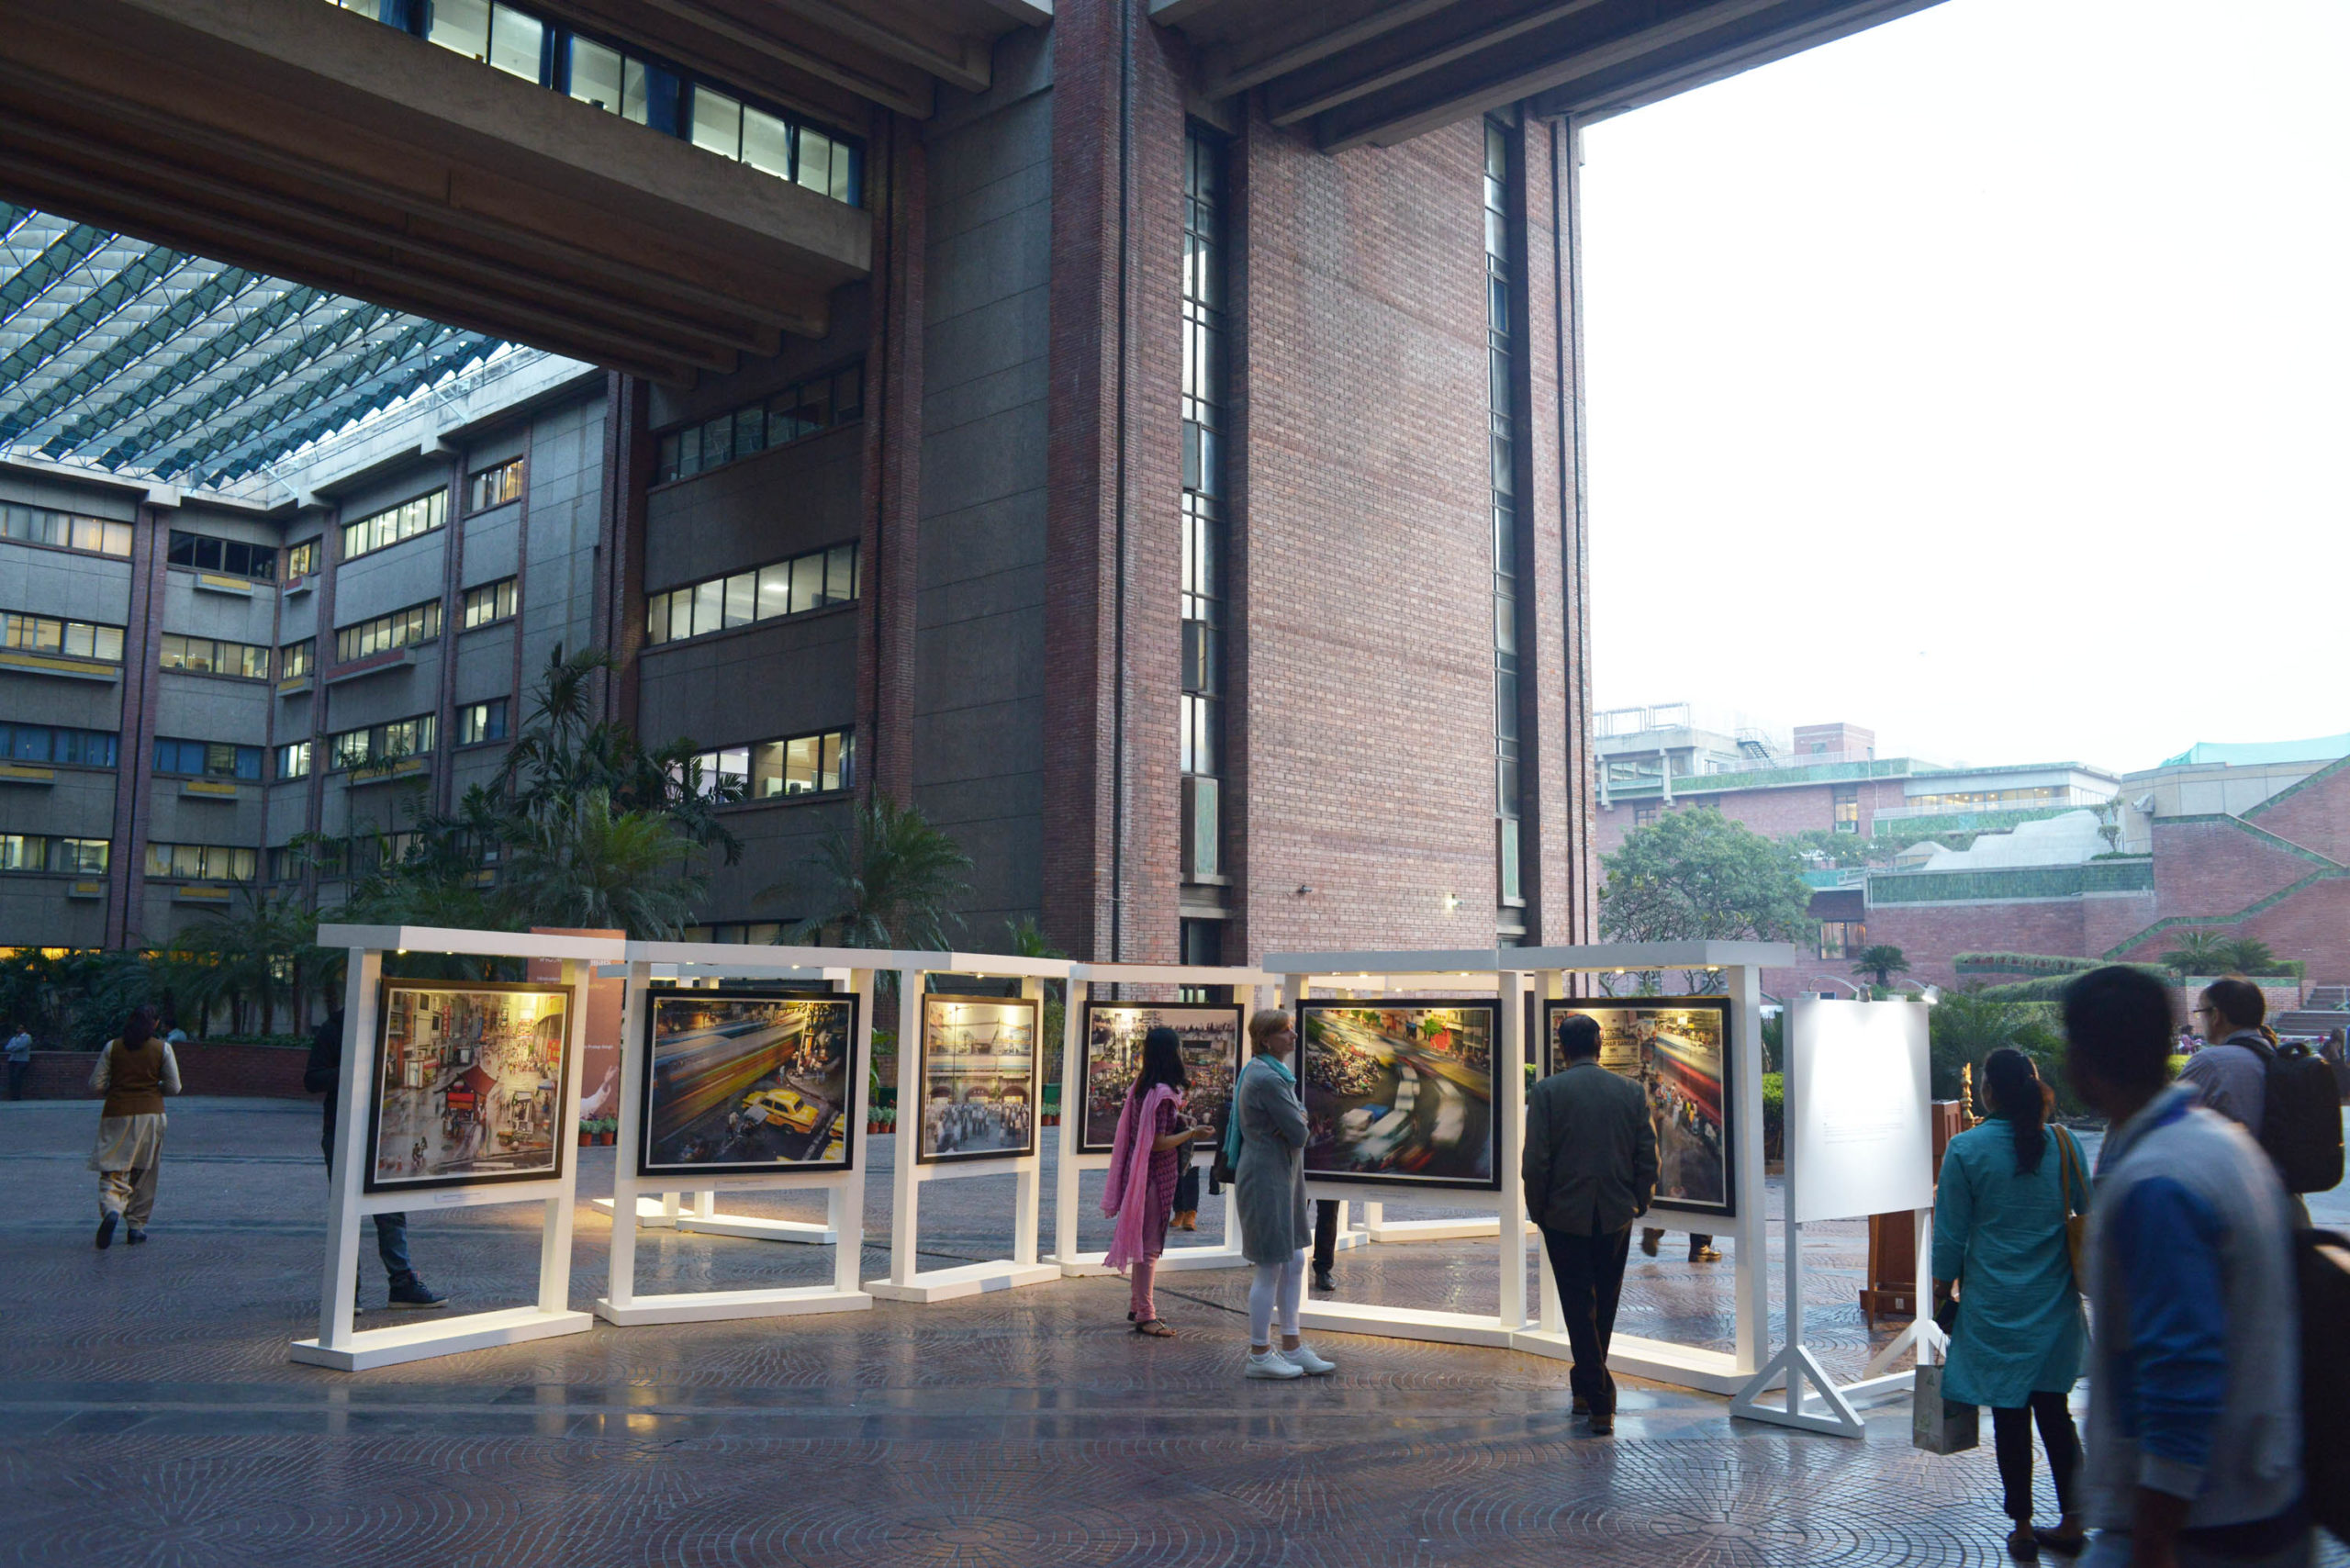 India Habitat Centre – Visual Arts Gallery, New Delhi